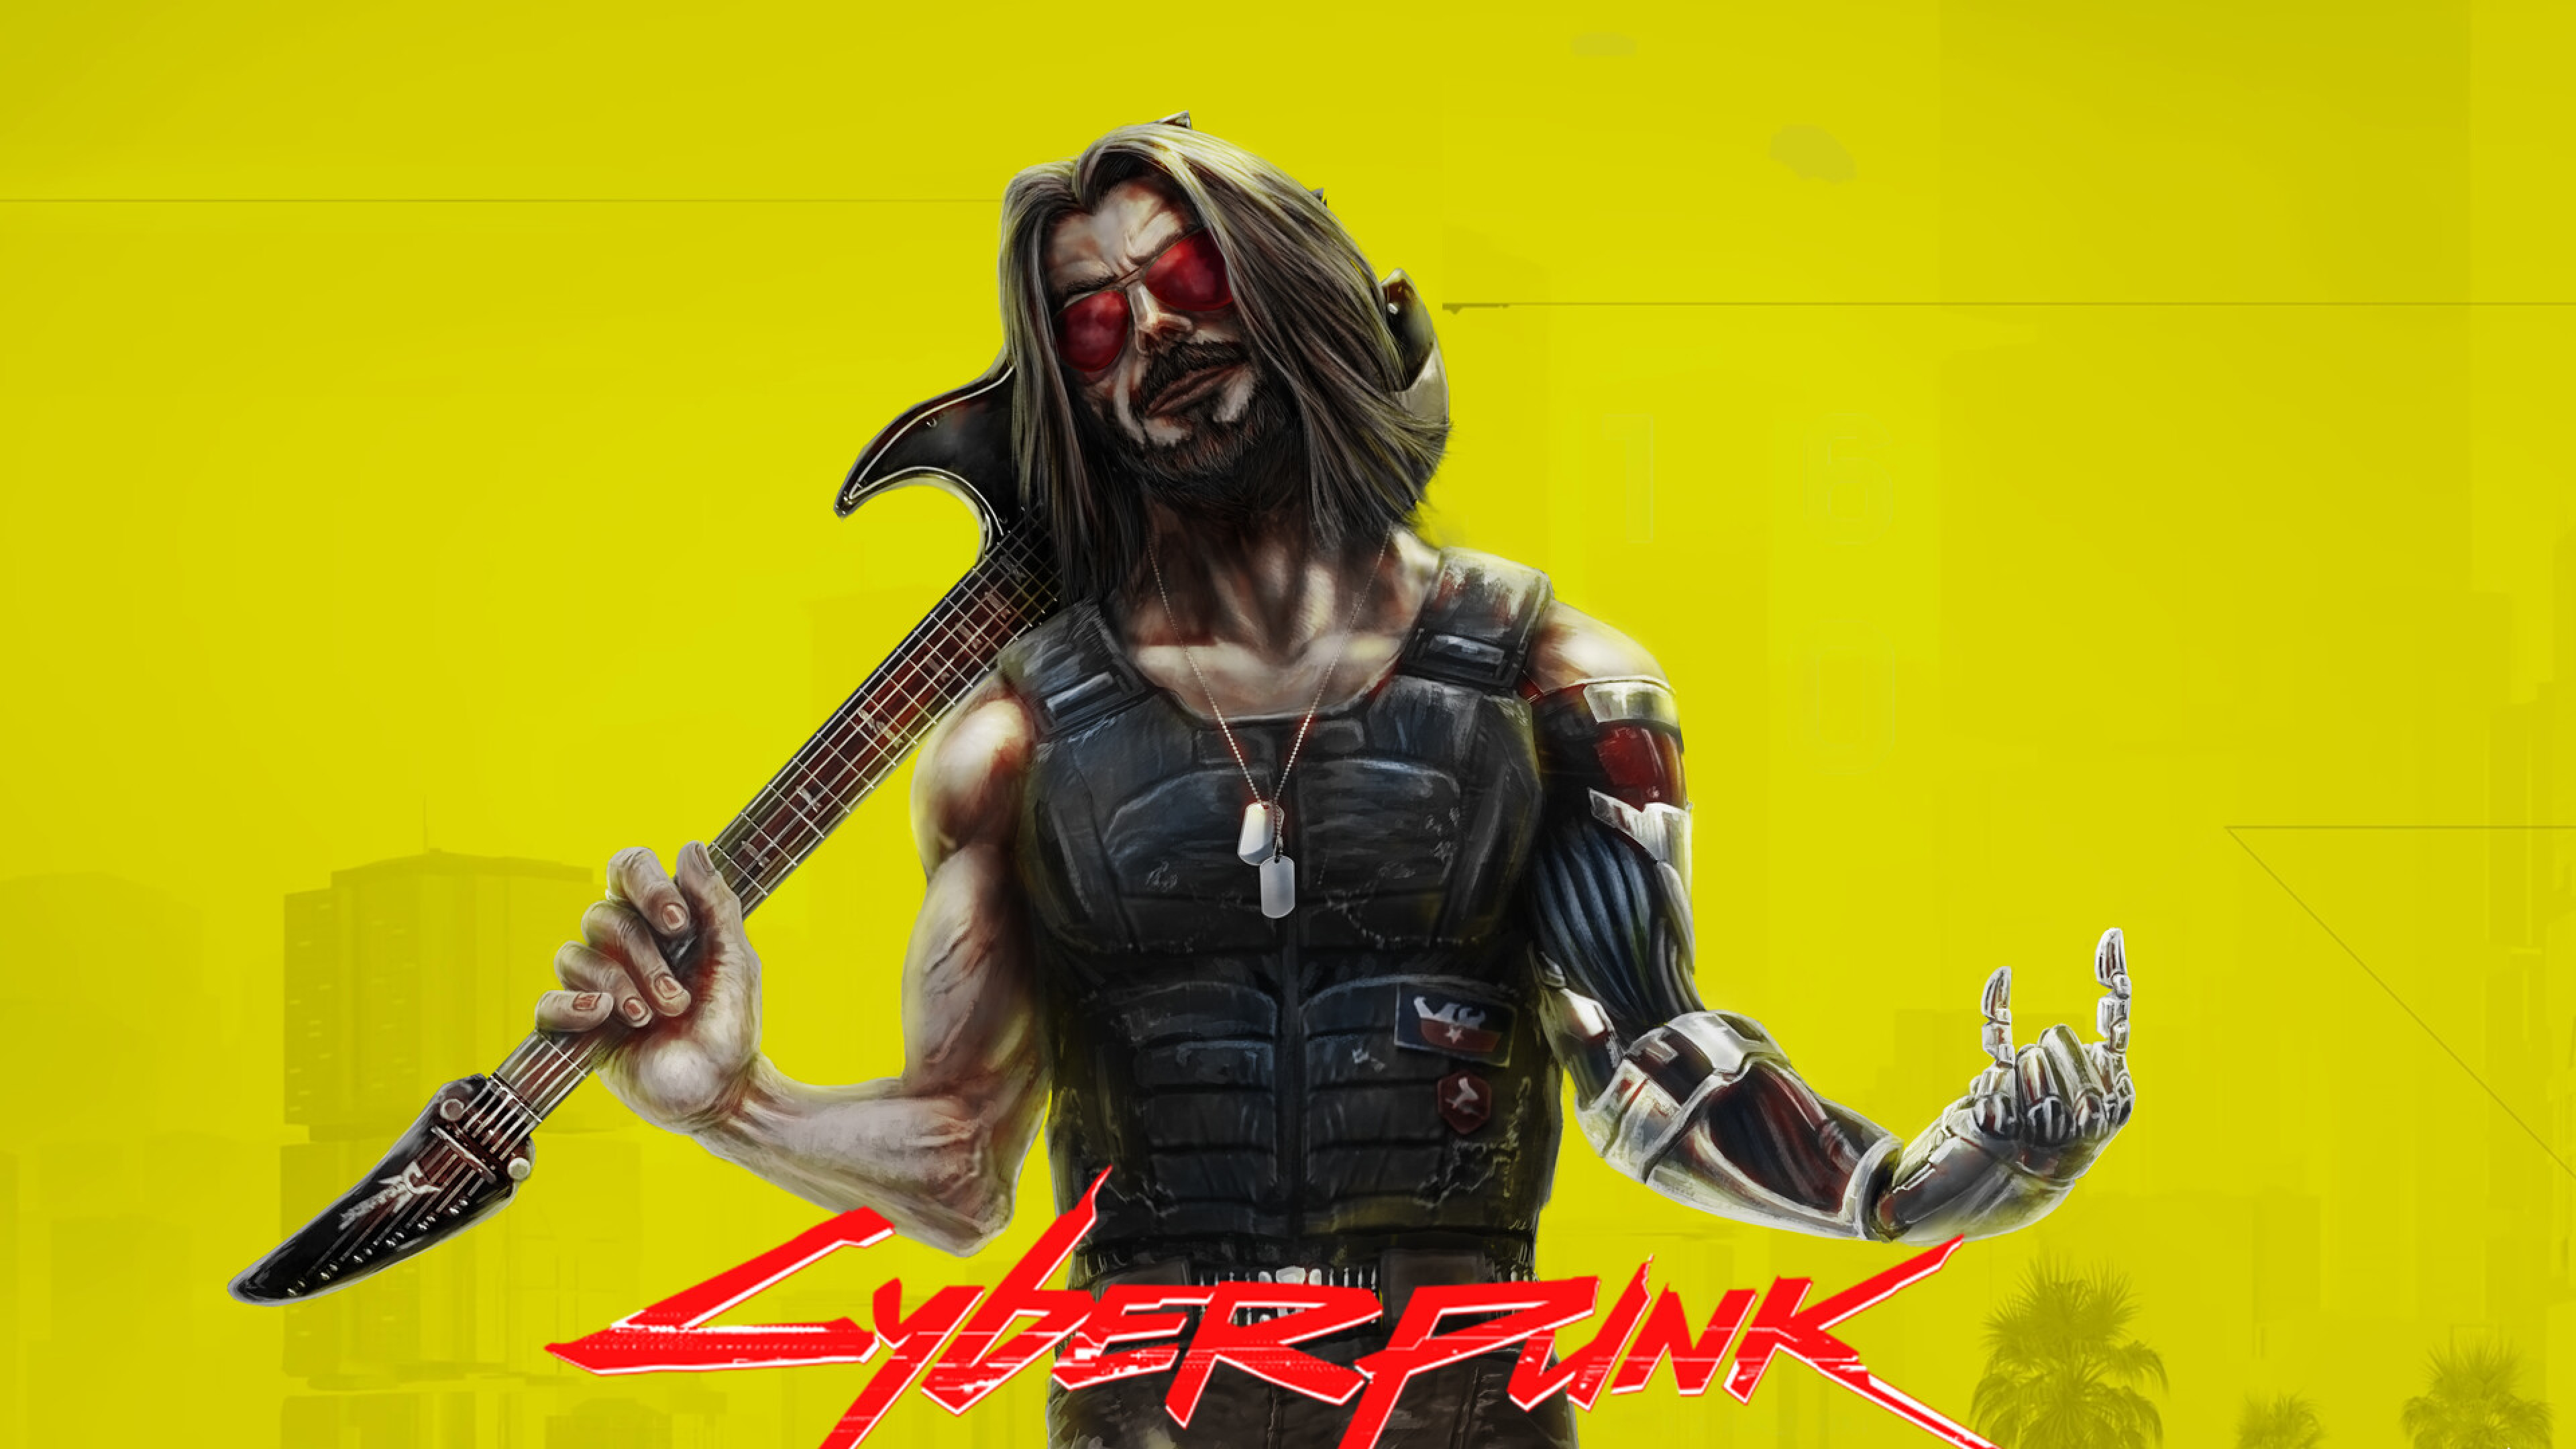 3840x2160 Johnny Silverhand aka Keanu Reeves In Cyberpunk ...